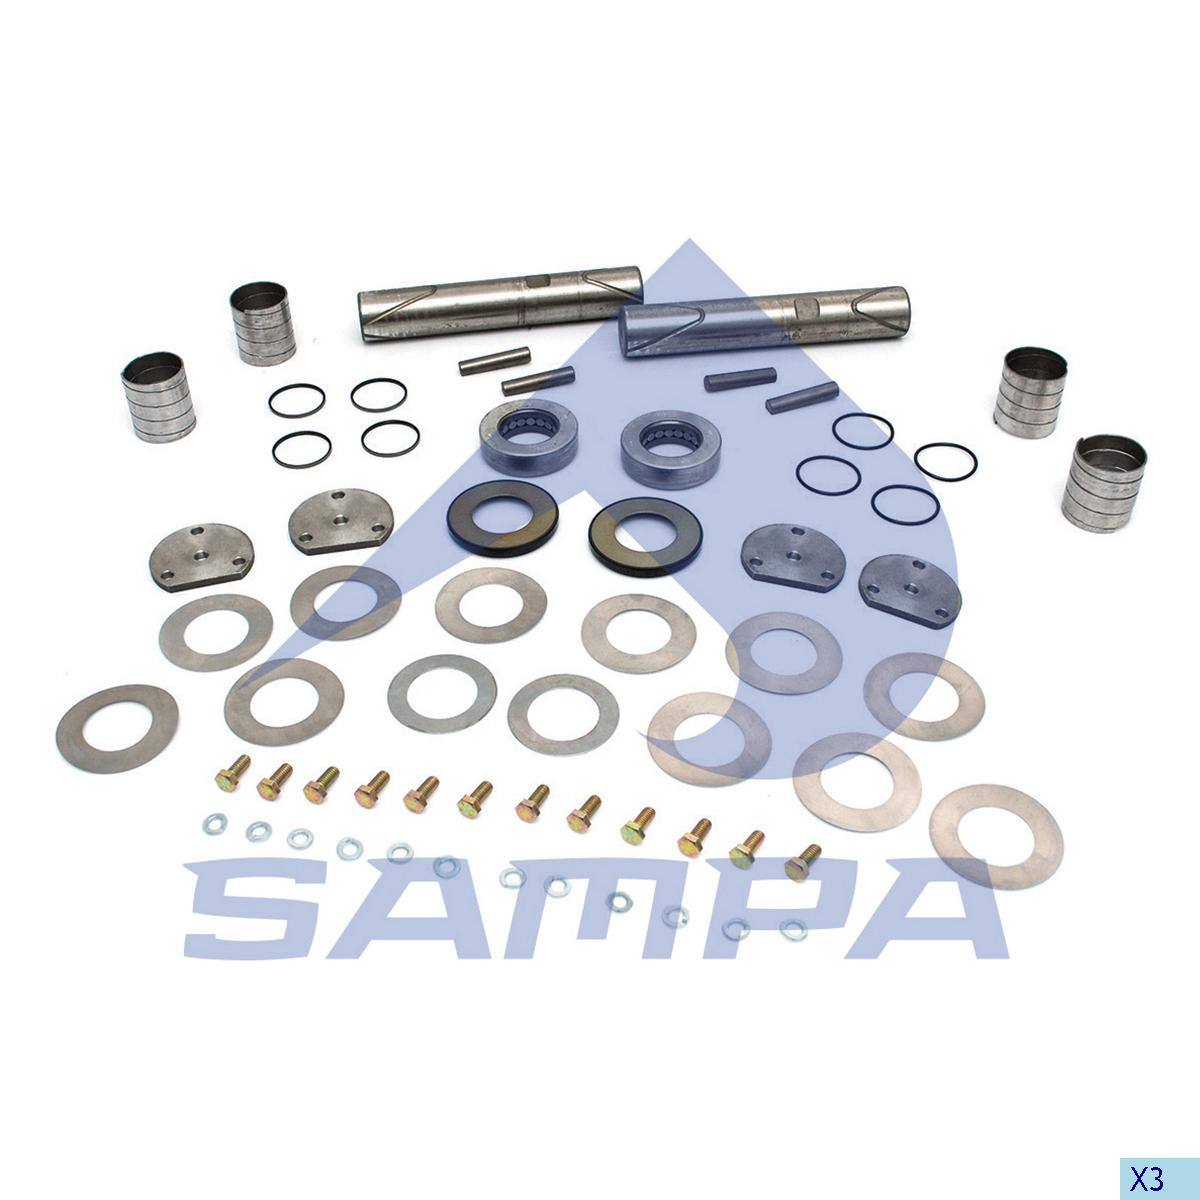 King Pin Kit, Axle Steering Knuckle, International Navistar, Power Unit